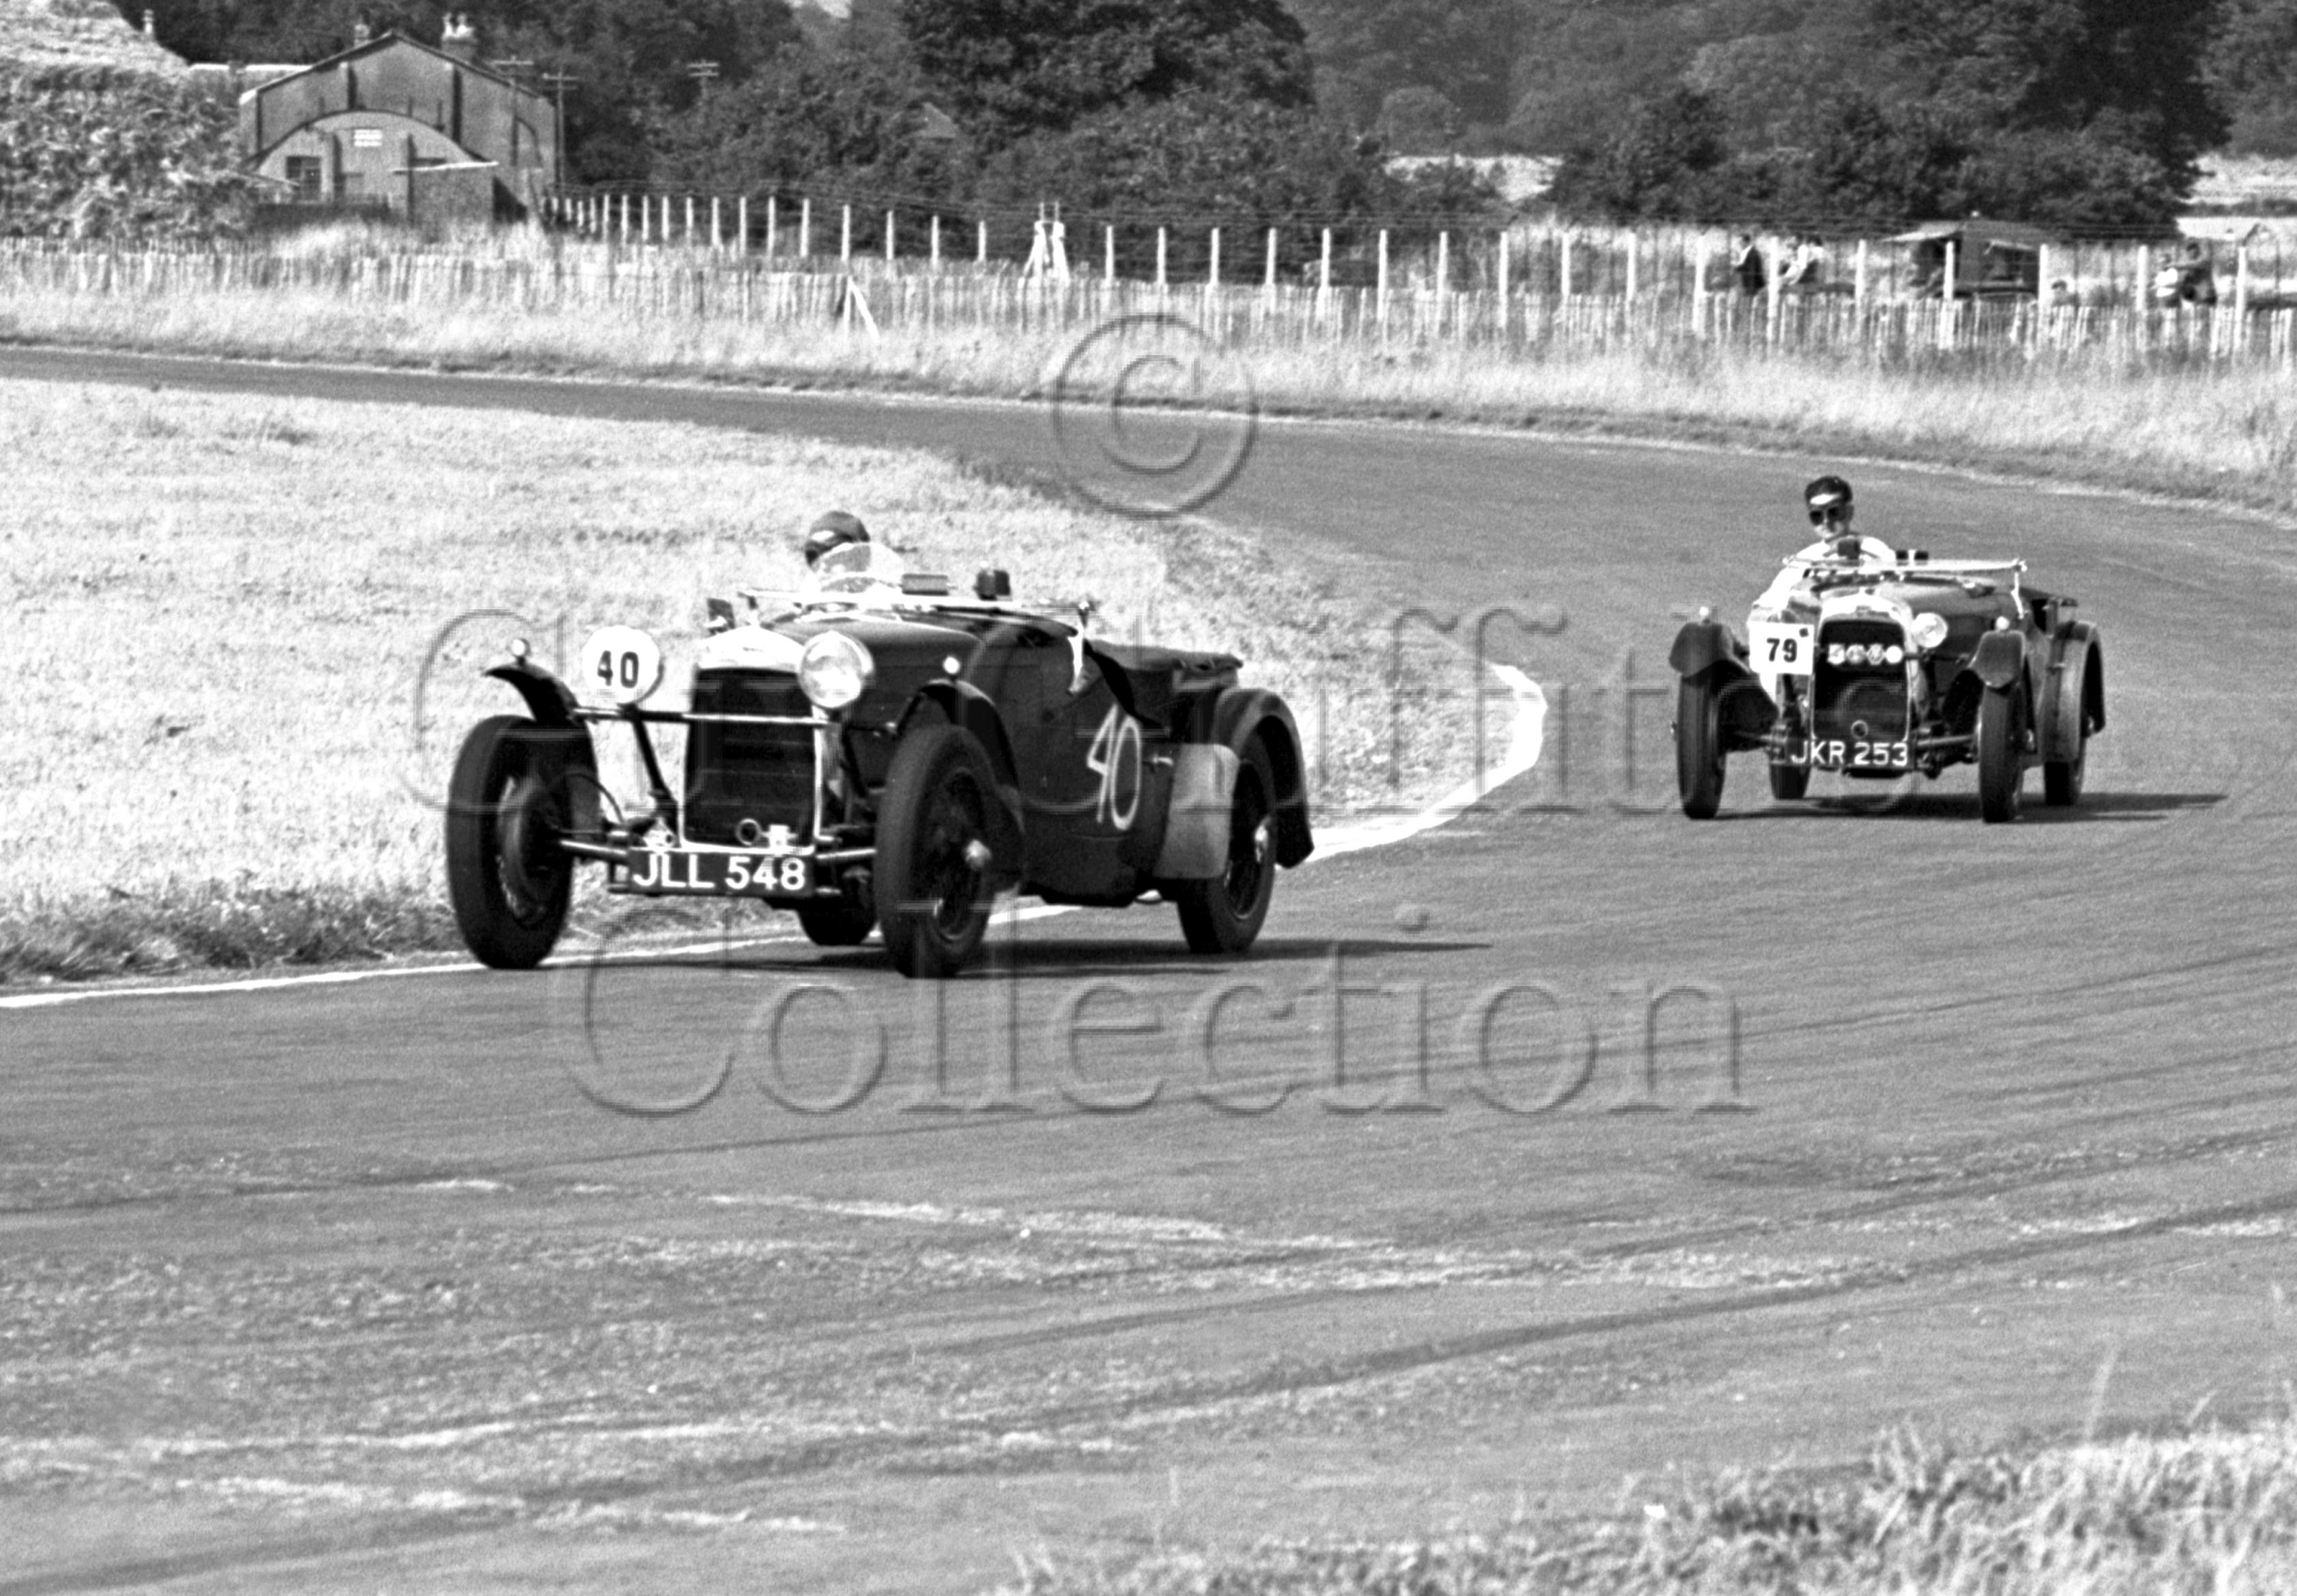 21-33–C-Meisl–HRG–Goodwood–13-08-1949.jpg - Guy Griffiths Collection